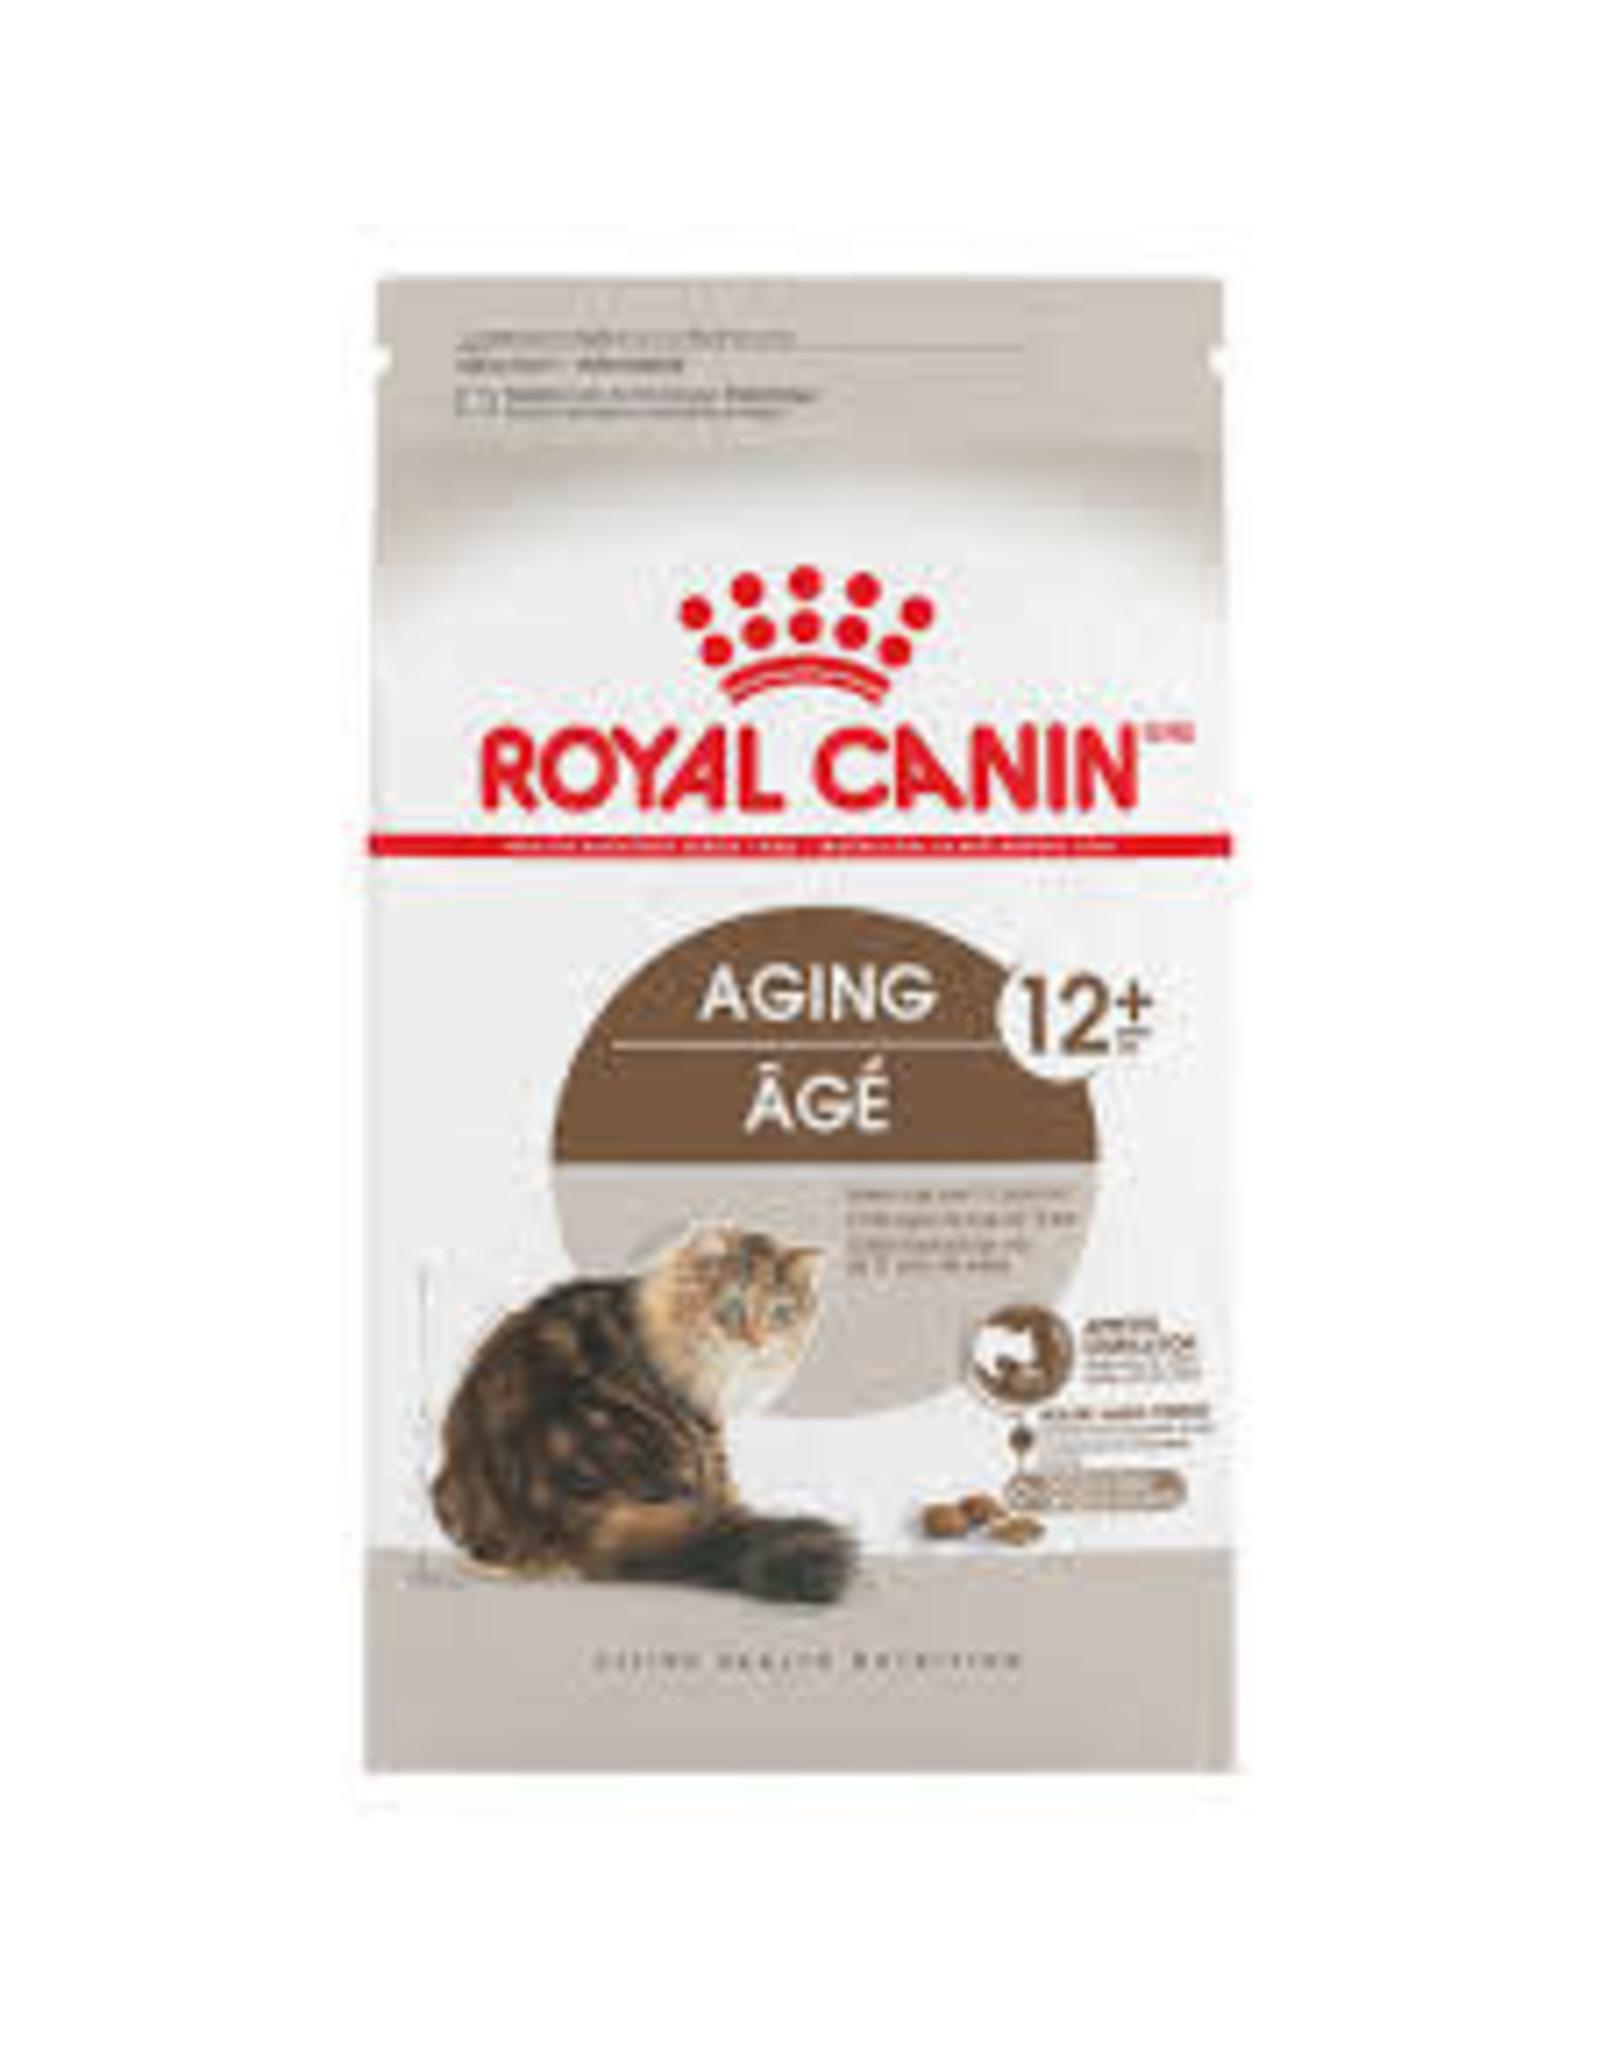 Royal Canin Royal Canin - Feline Aging 12+ 6lb